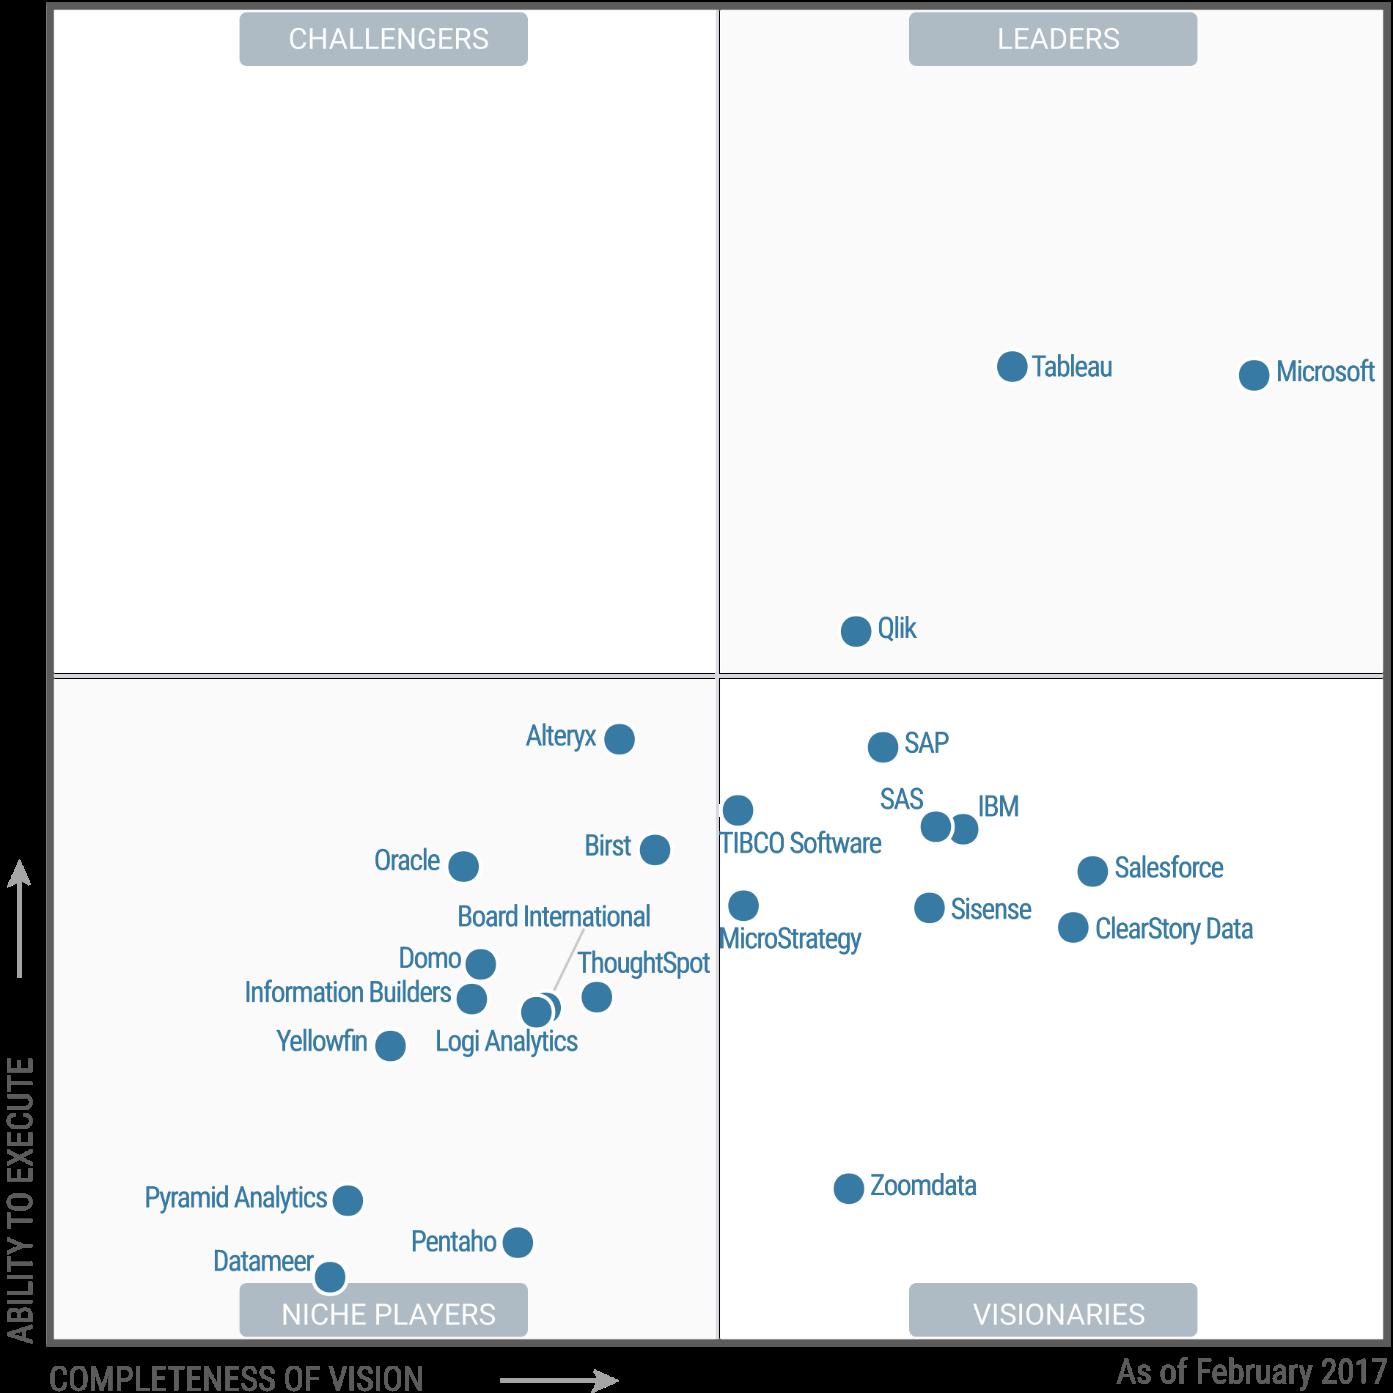 The 2017 Gartner Magic Quadrant for Business Intelligence and Analytics